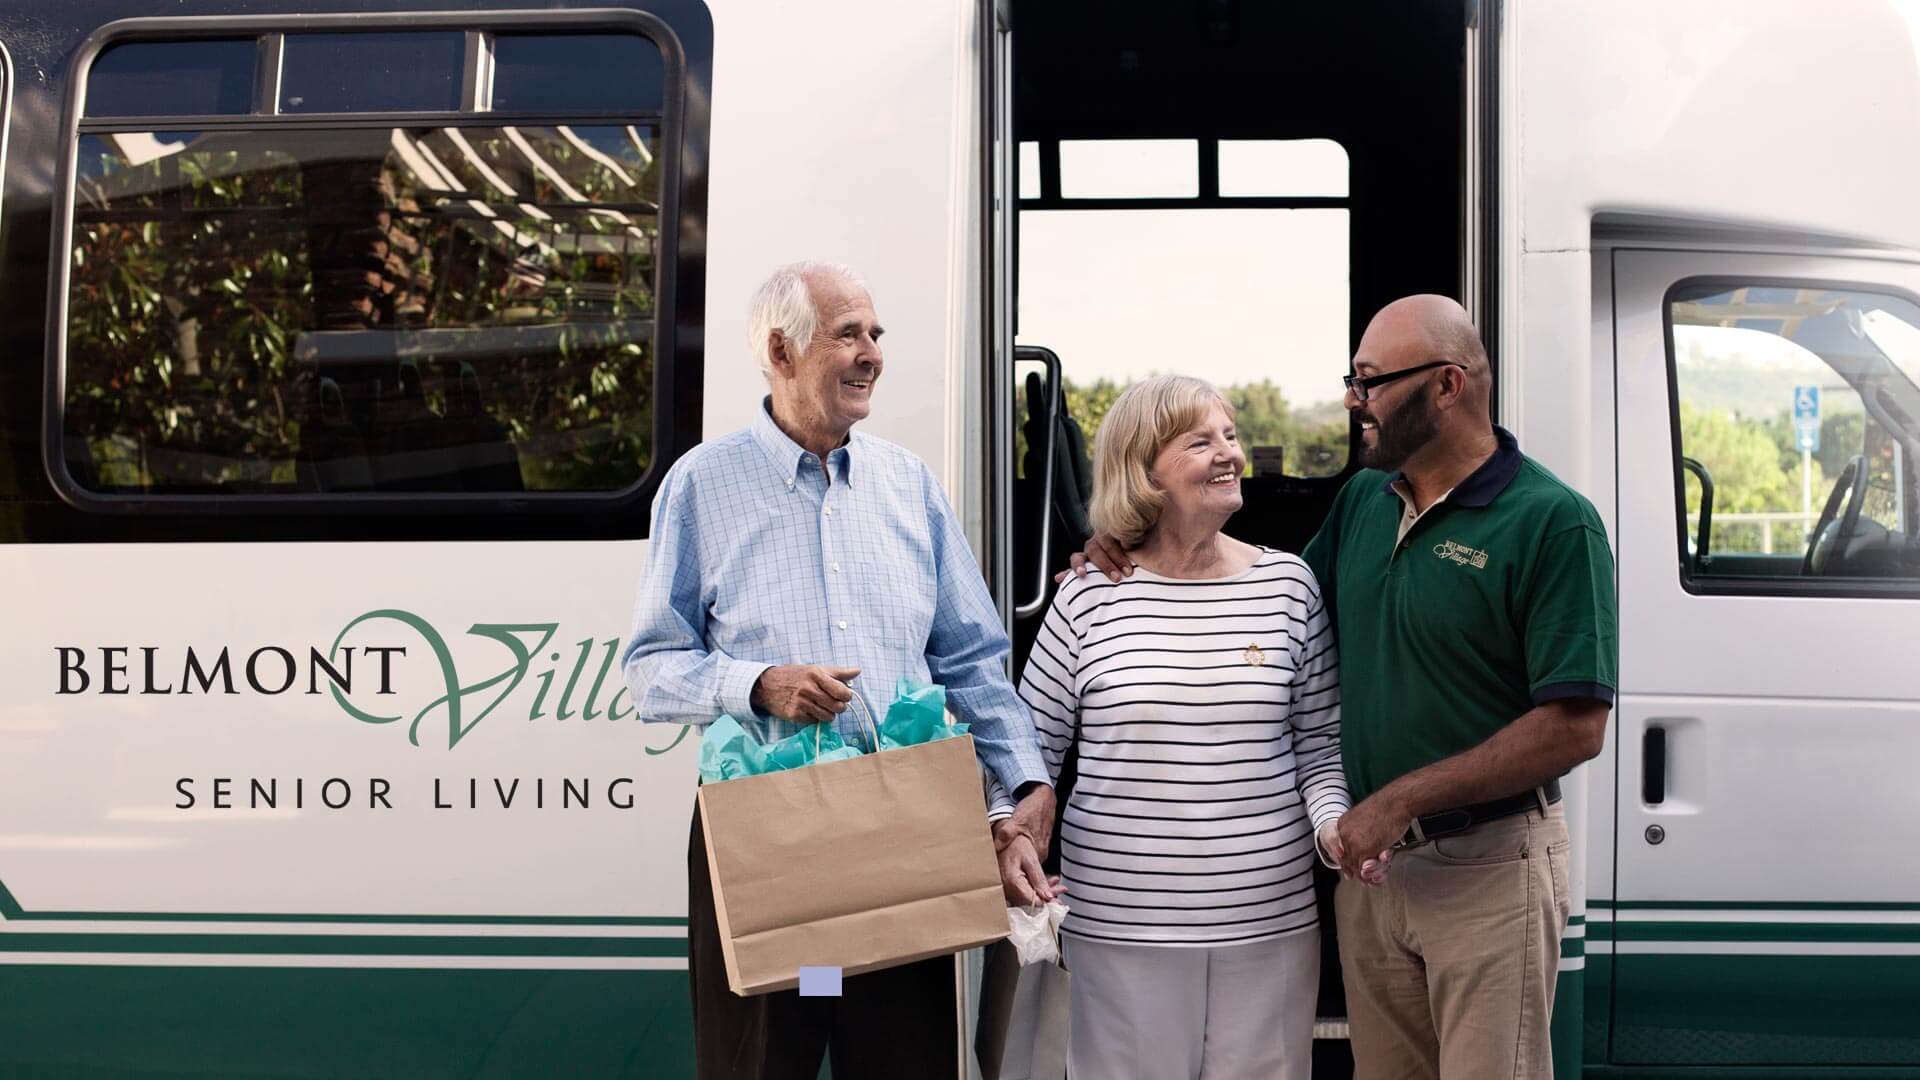 Belmont Village Assisted Living